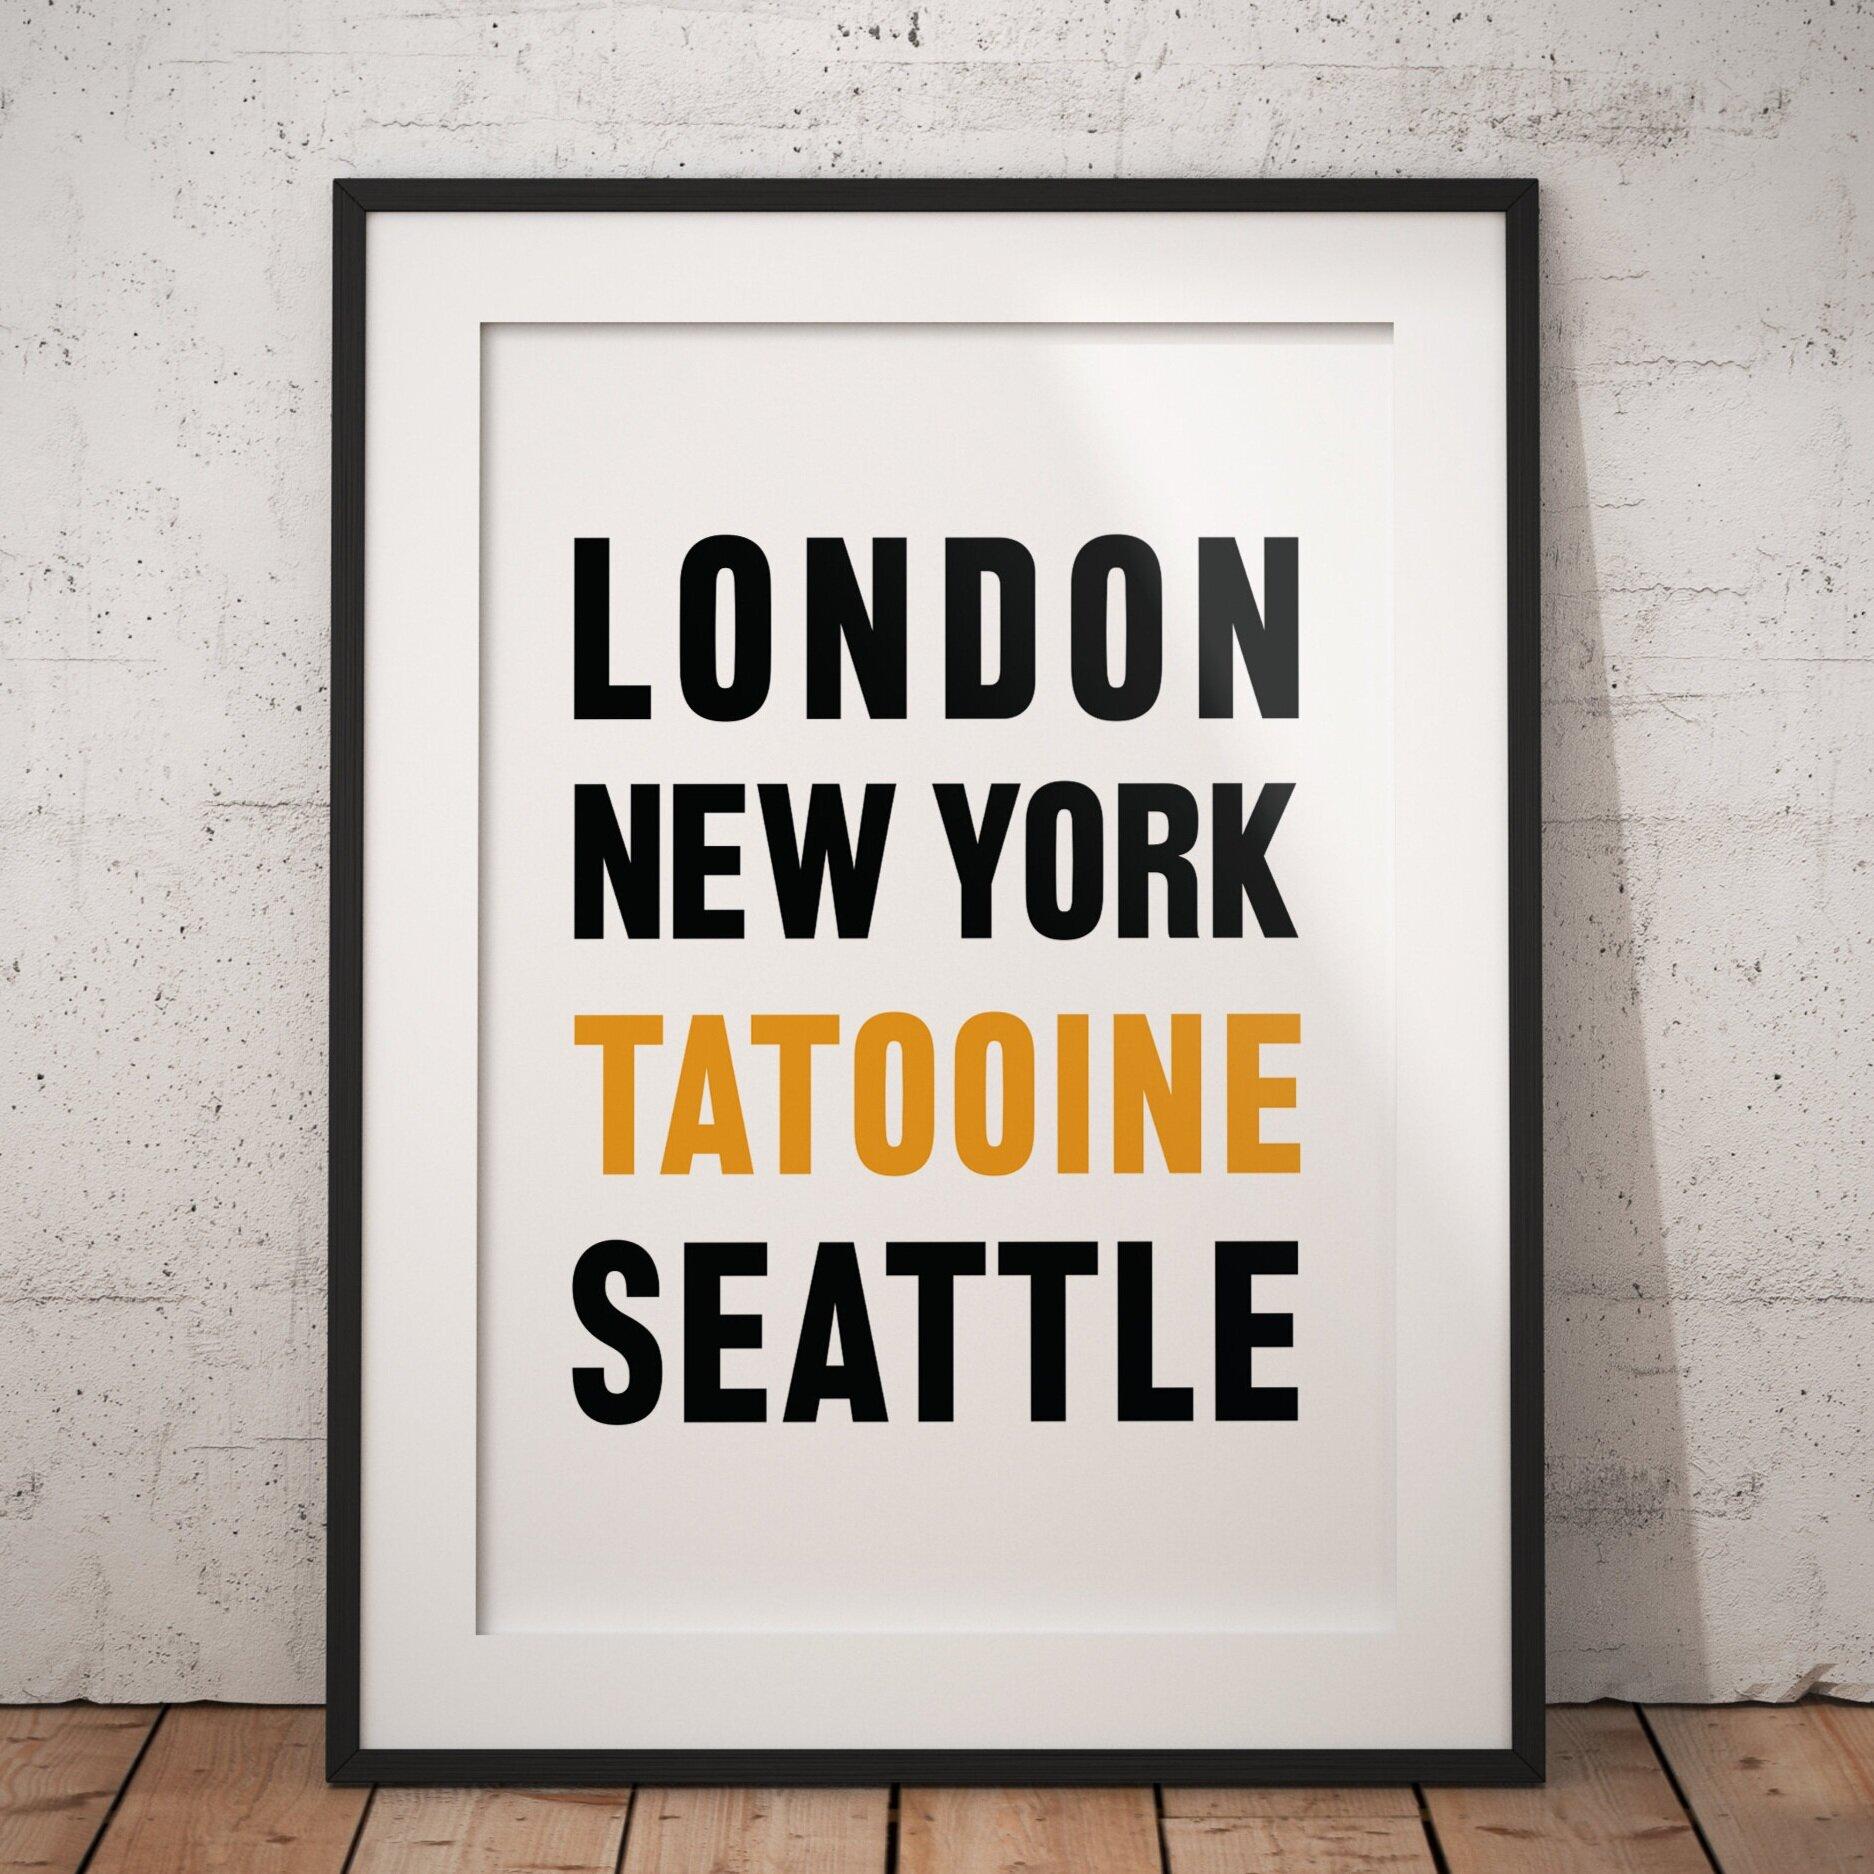 Travel - Tatoine